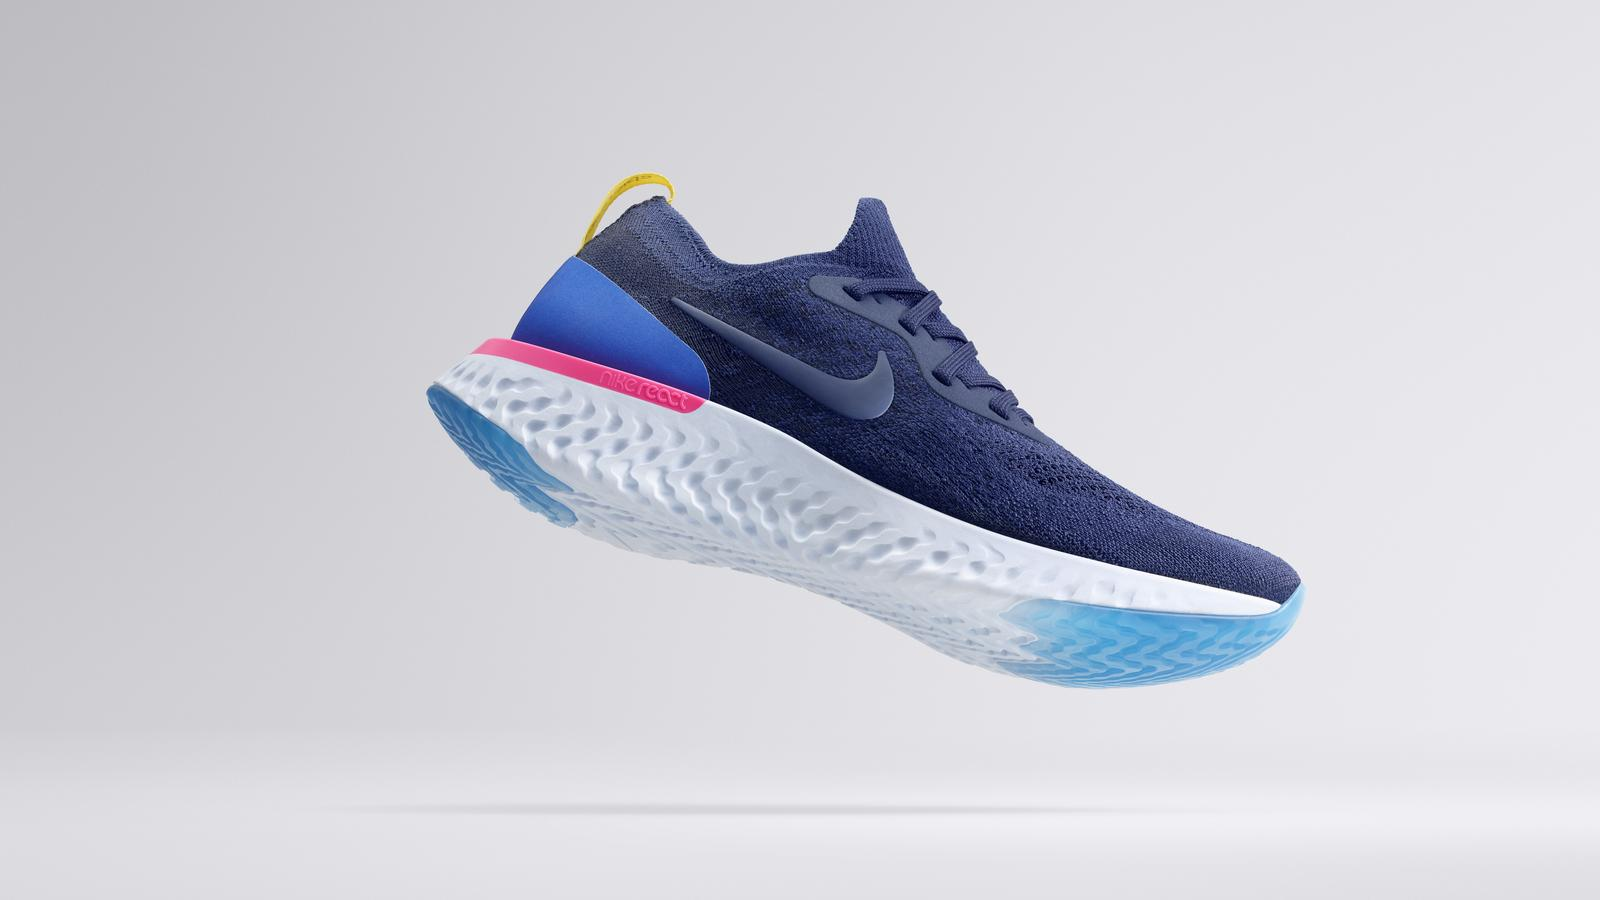 size 40 db5f7 23616 Foulée L eponge Jolie React Epic Nike Flyknit Running Du fddAgHxwq